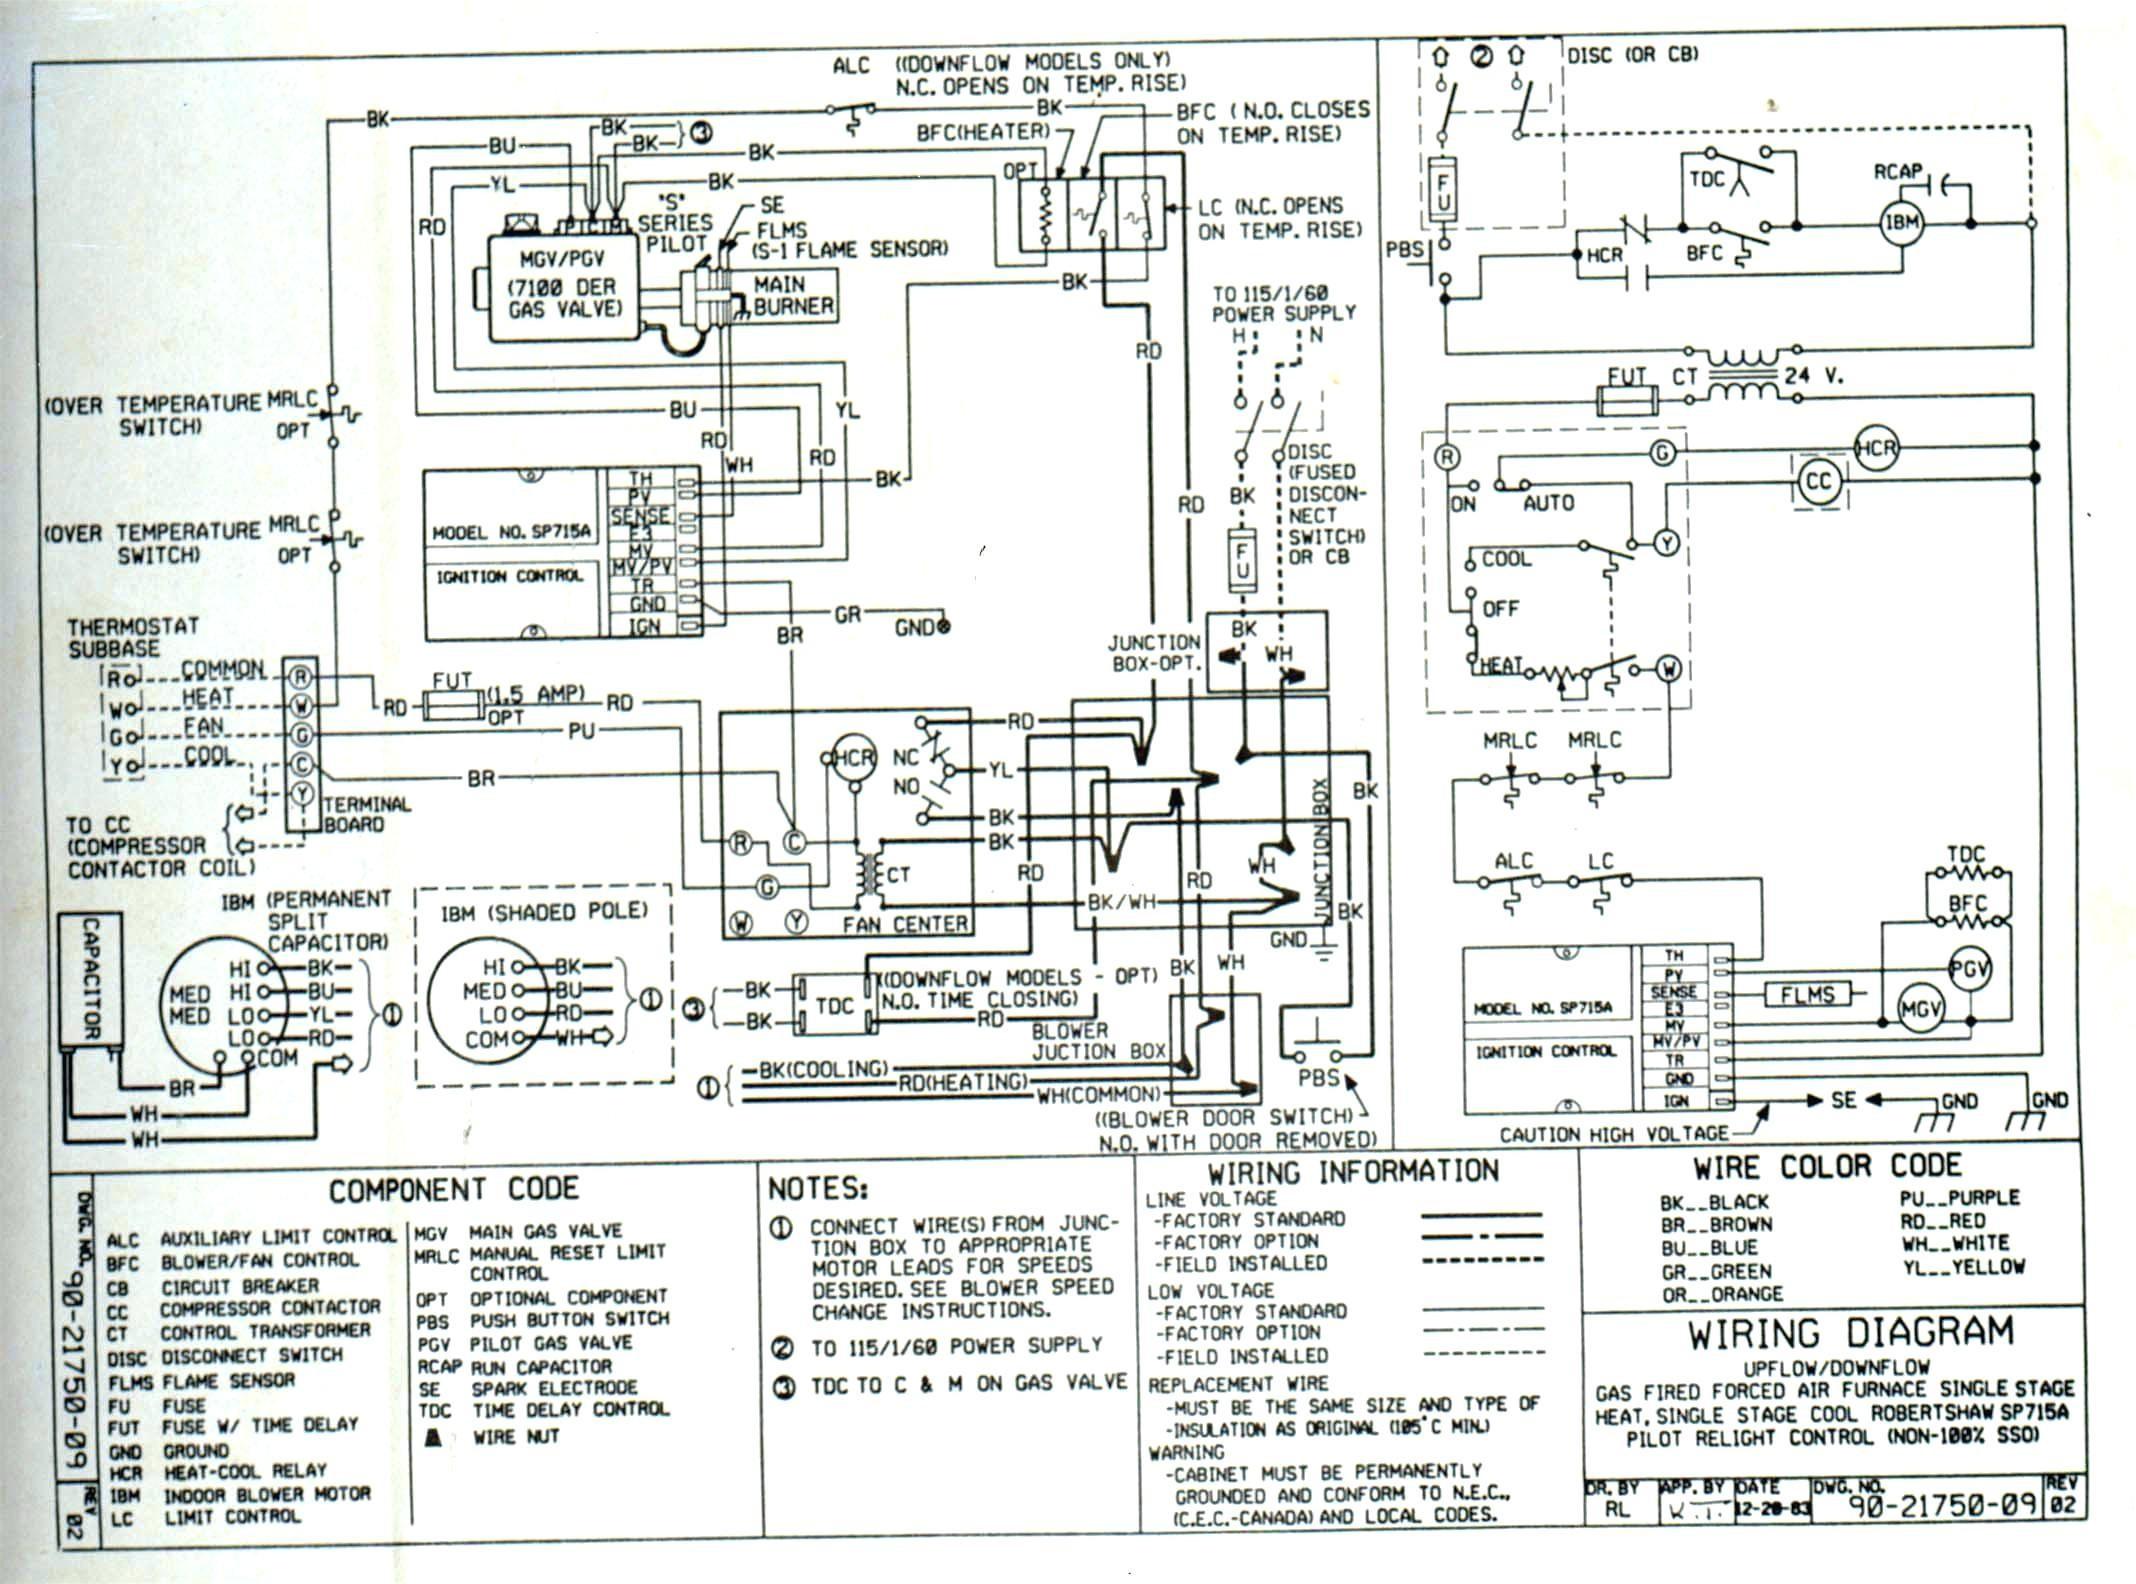 Wiring Diagram For Trane Air Conditioner 2018 Wiring Diagram For Ac Condenser Inspirationa Trane Air Conditioner